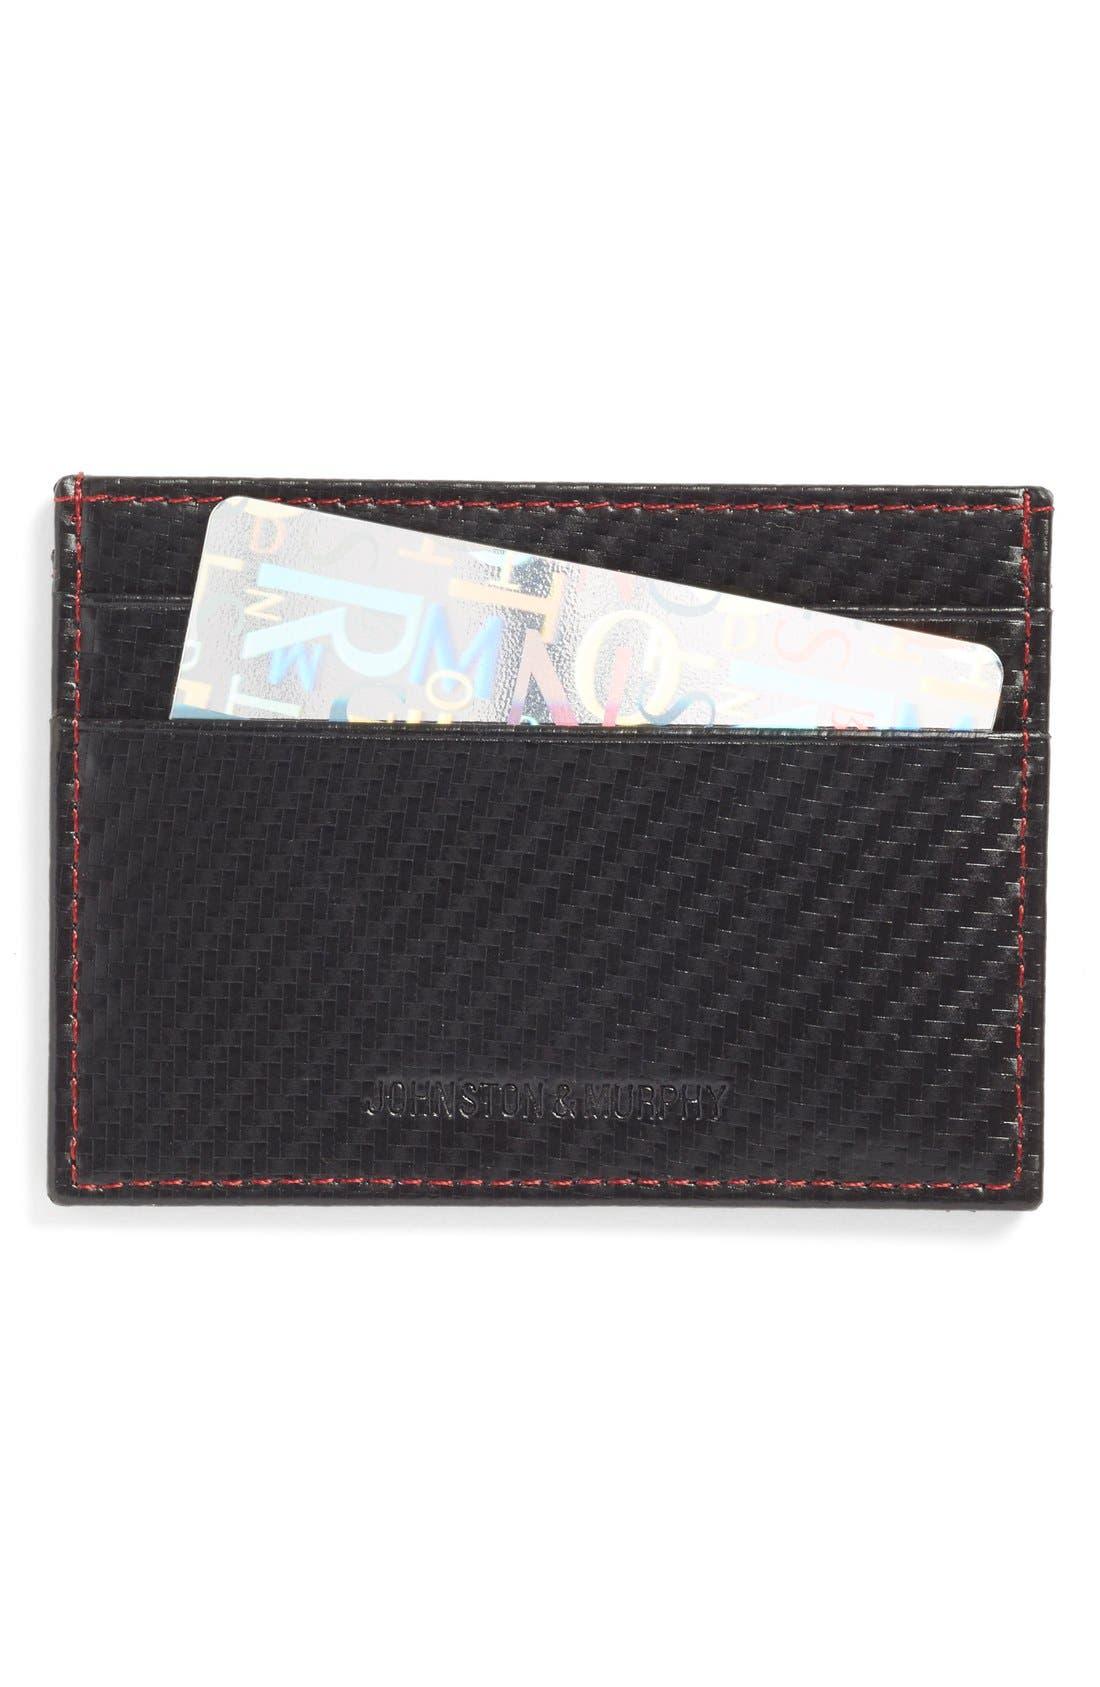 Johnston & Murphy Card Case